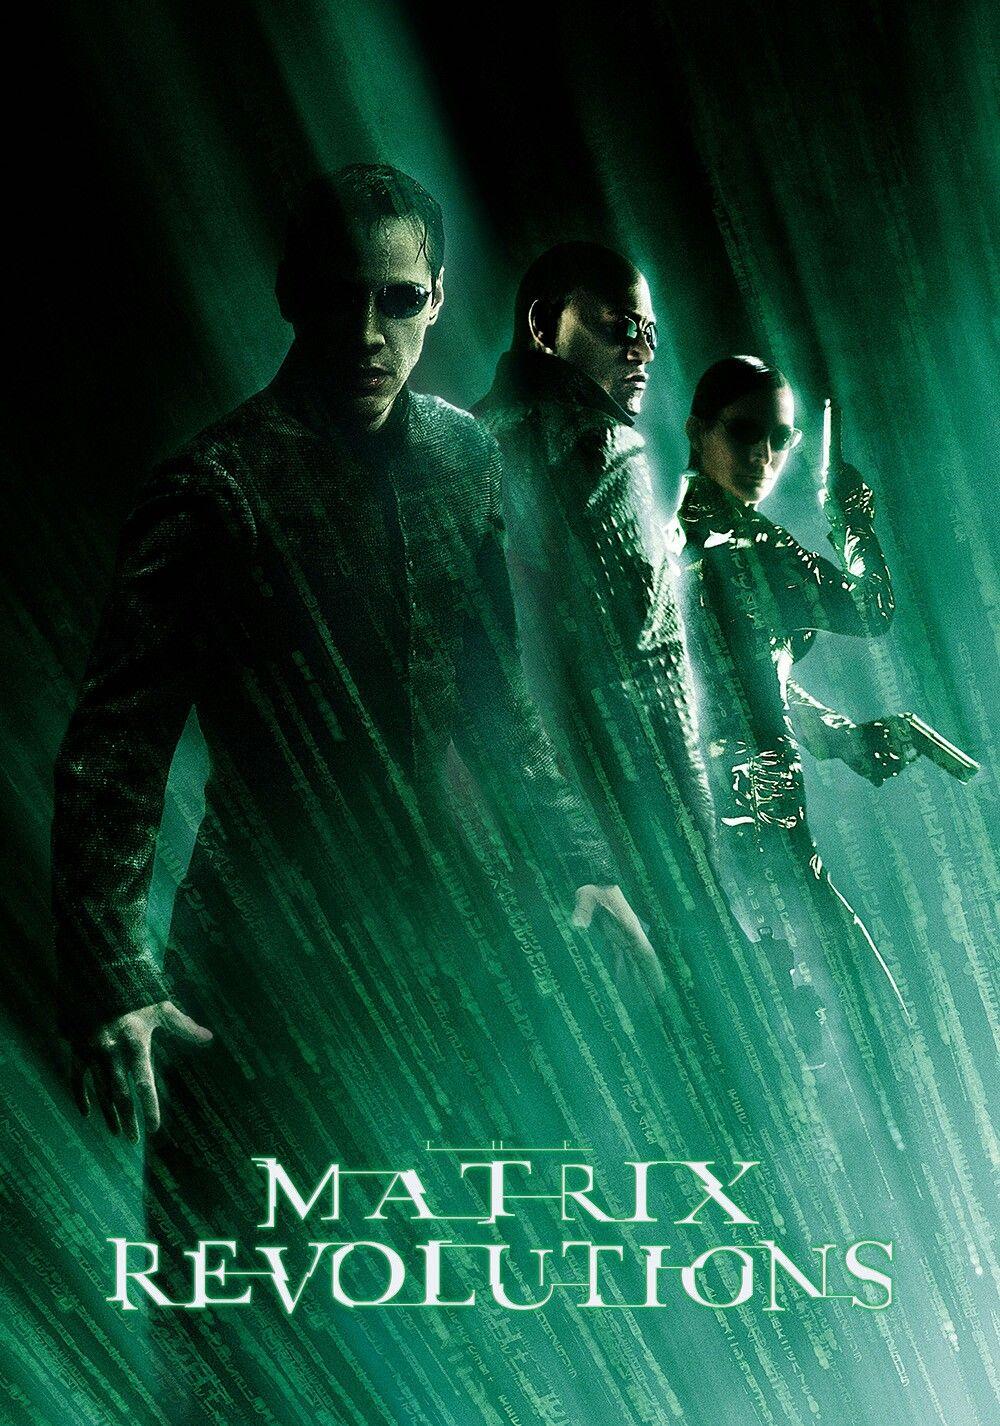 The Matrix Revolutions 3 (2003) ปฏิวัติมนุษย์เหนือโลก